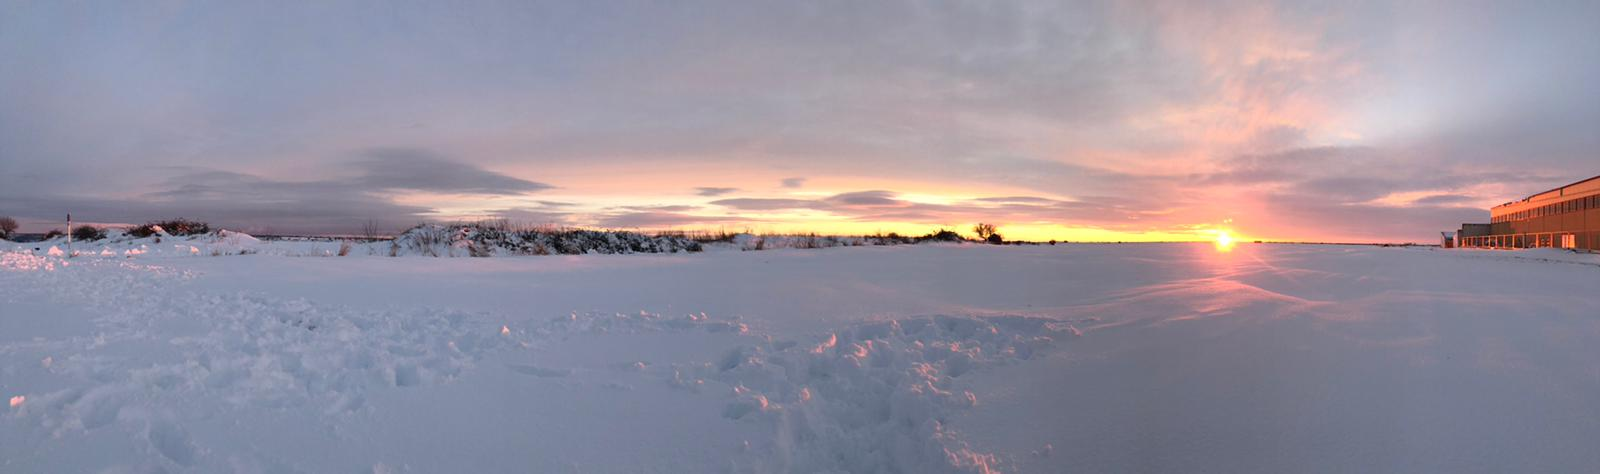 panorámica Brihuega nevada